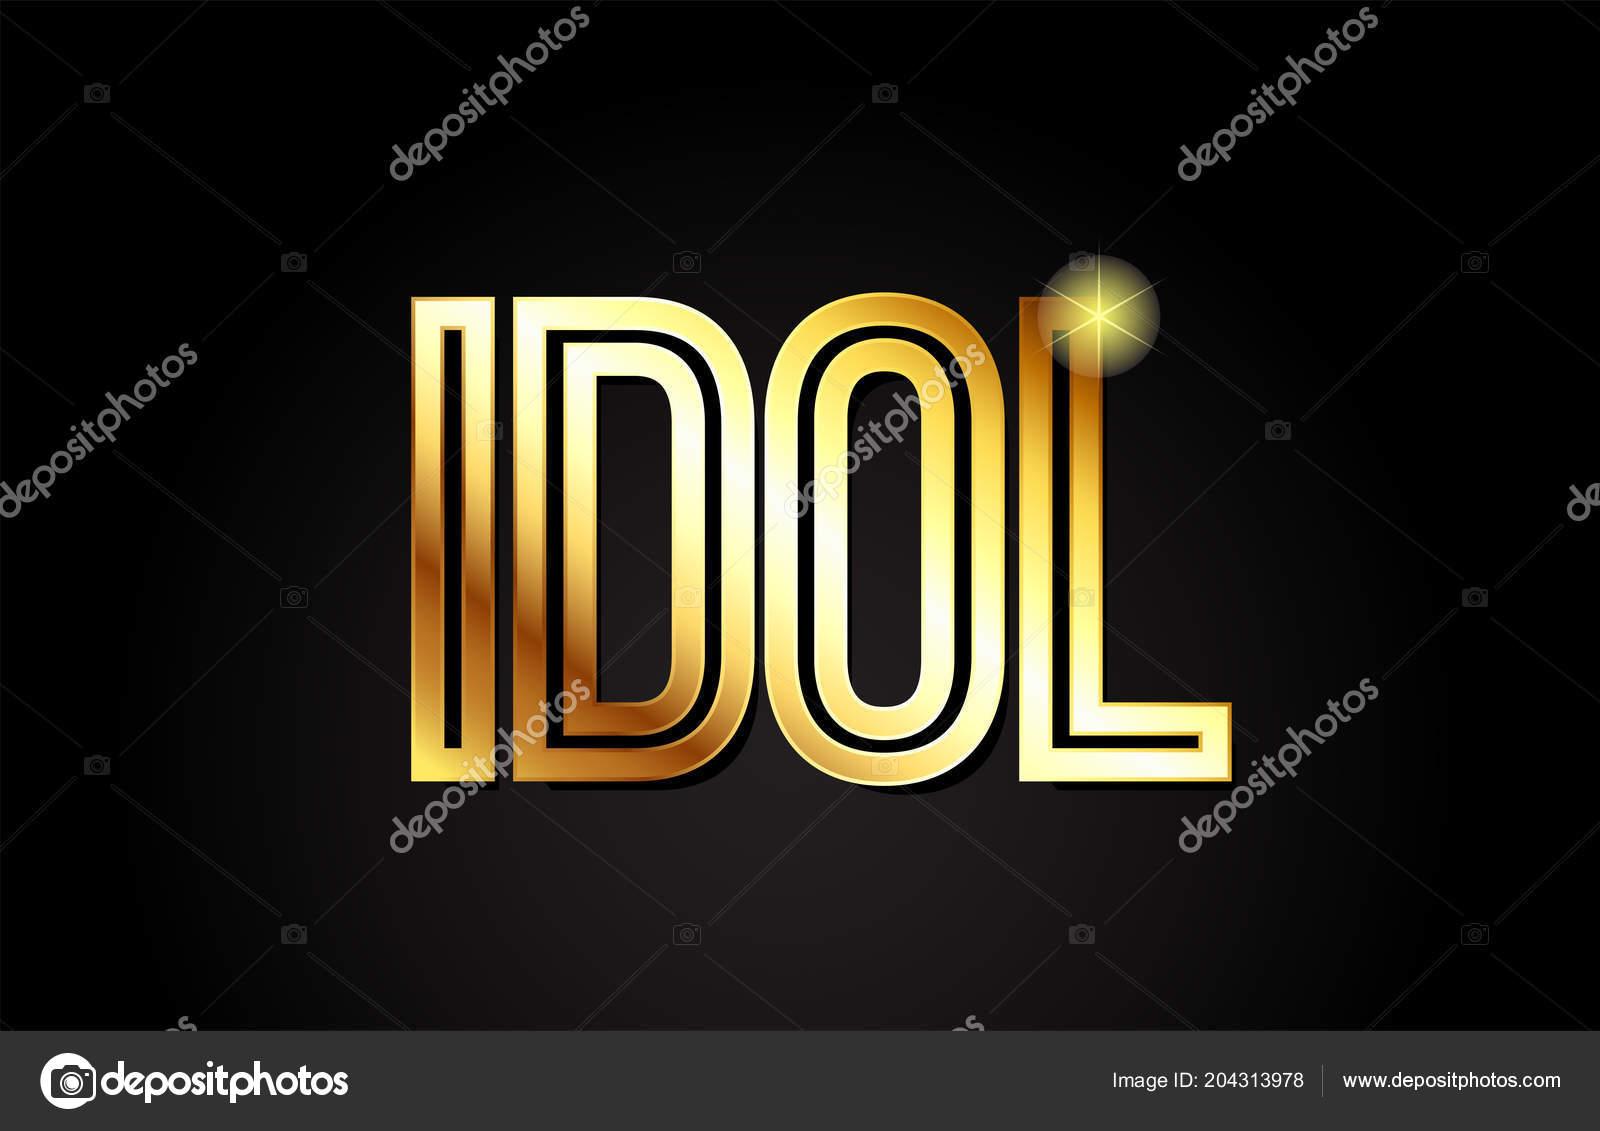 idol word typography design gold golden color suitable logo banner